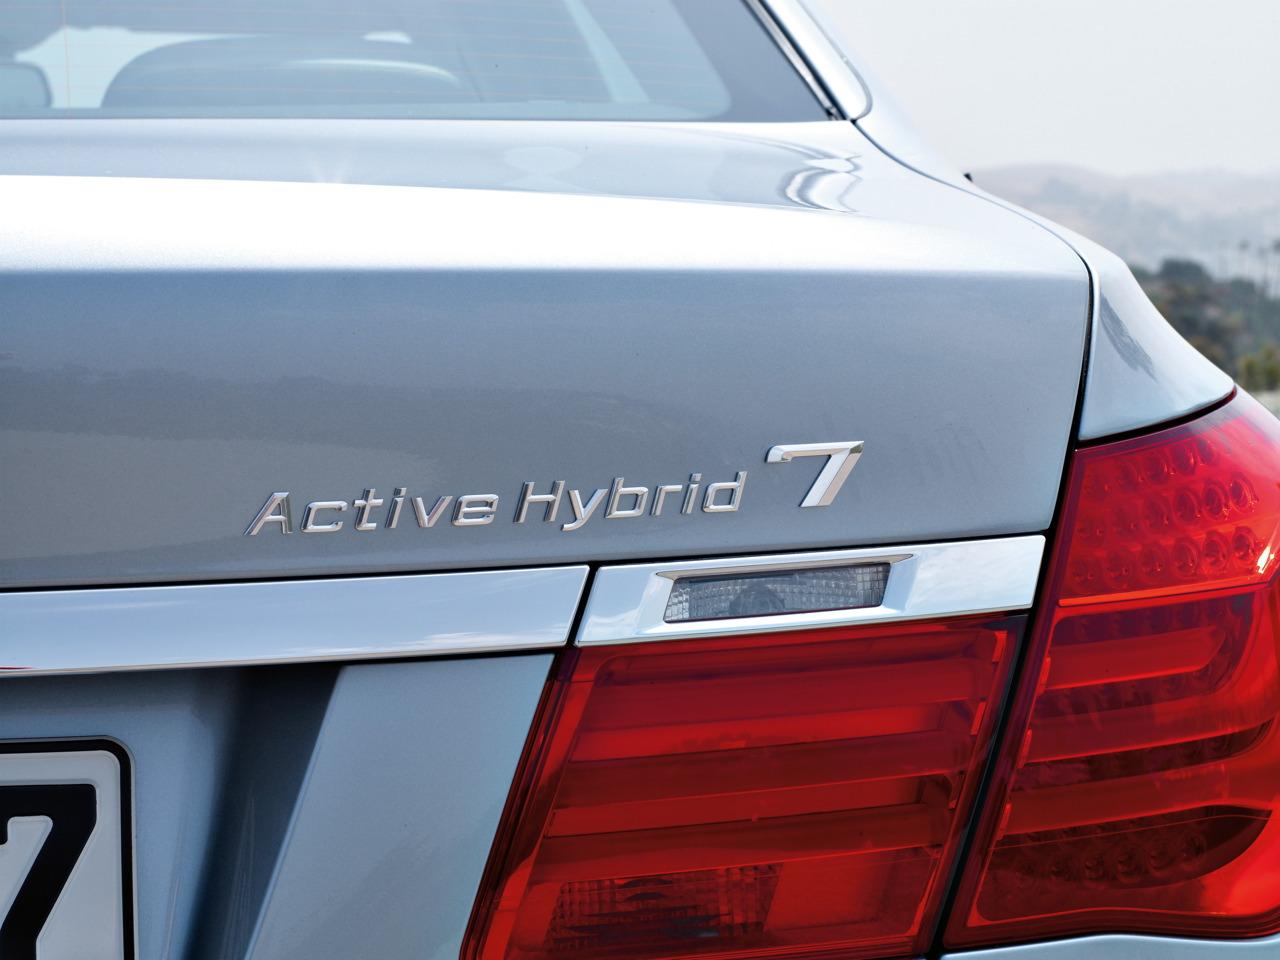 BMW Hybrids Cars